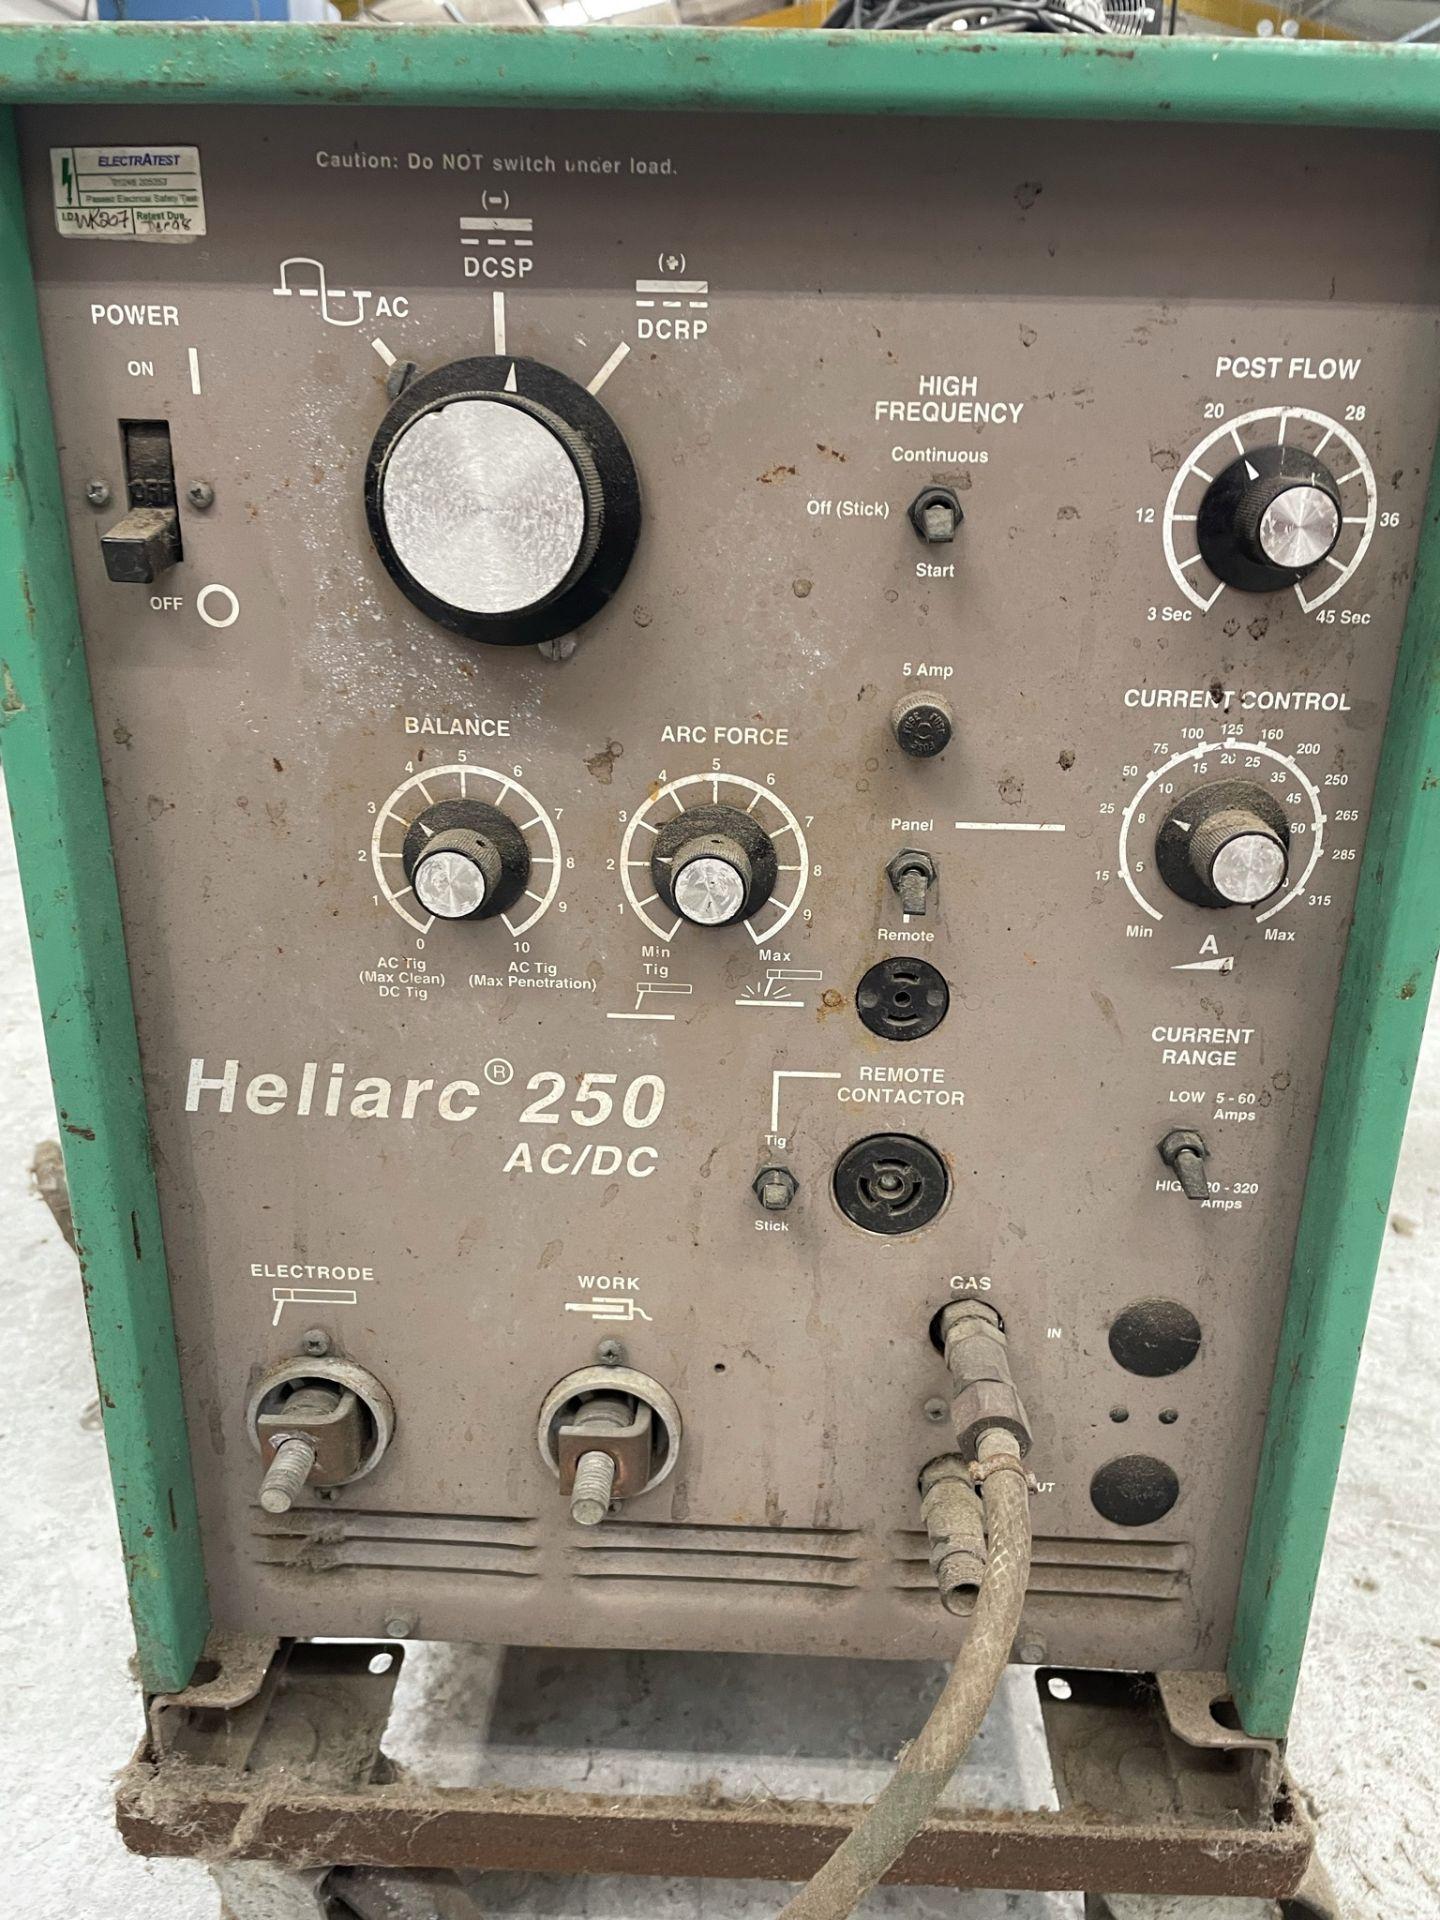 L-Tec Heliarc 250 Tig/Stick Welder - Image 4 of 4